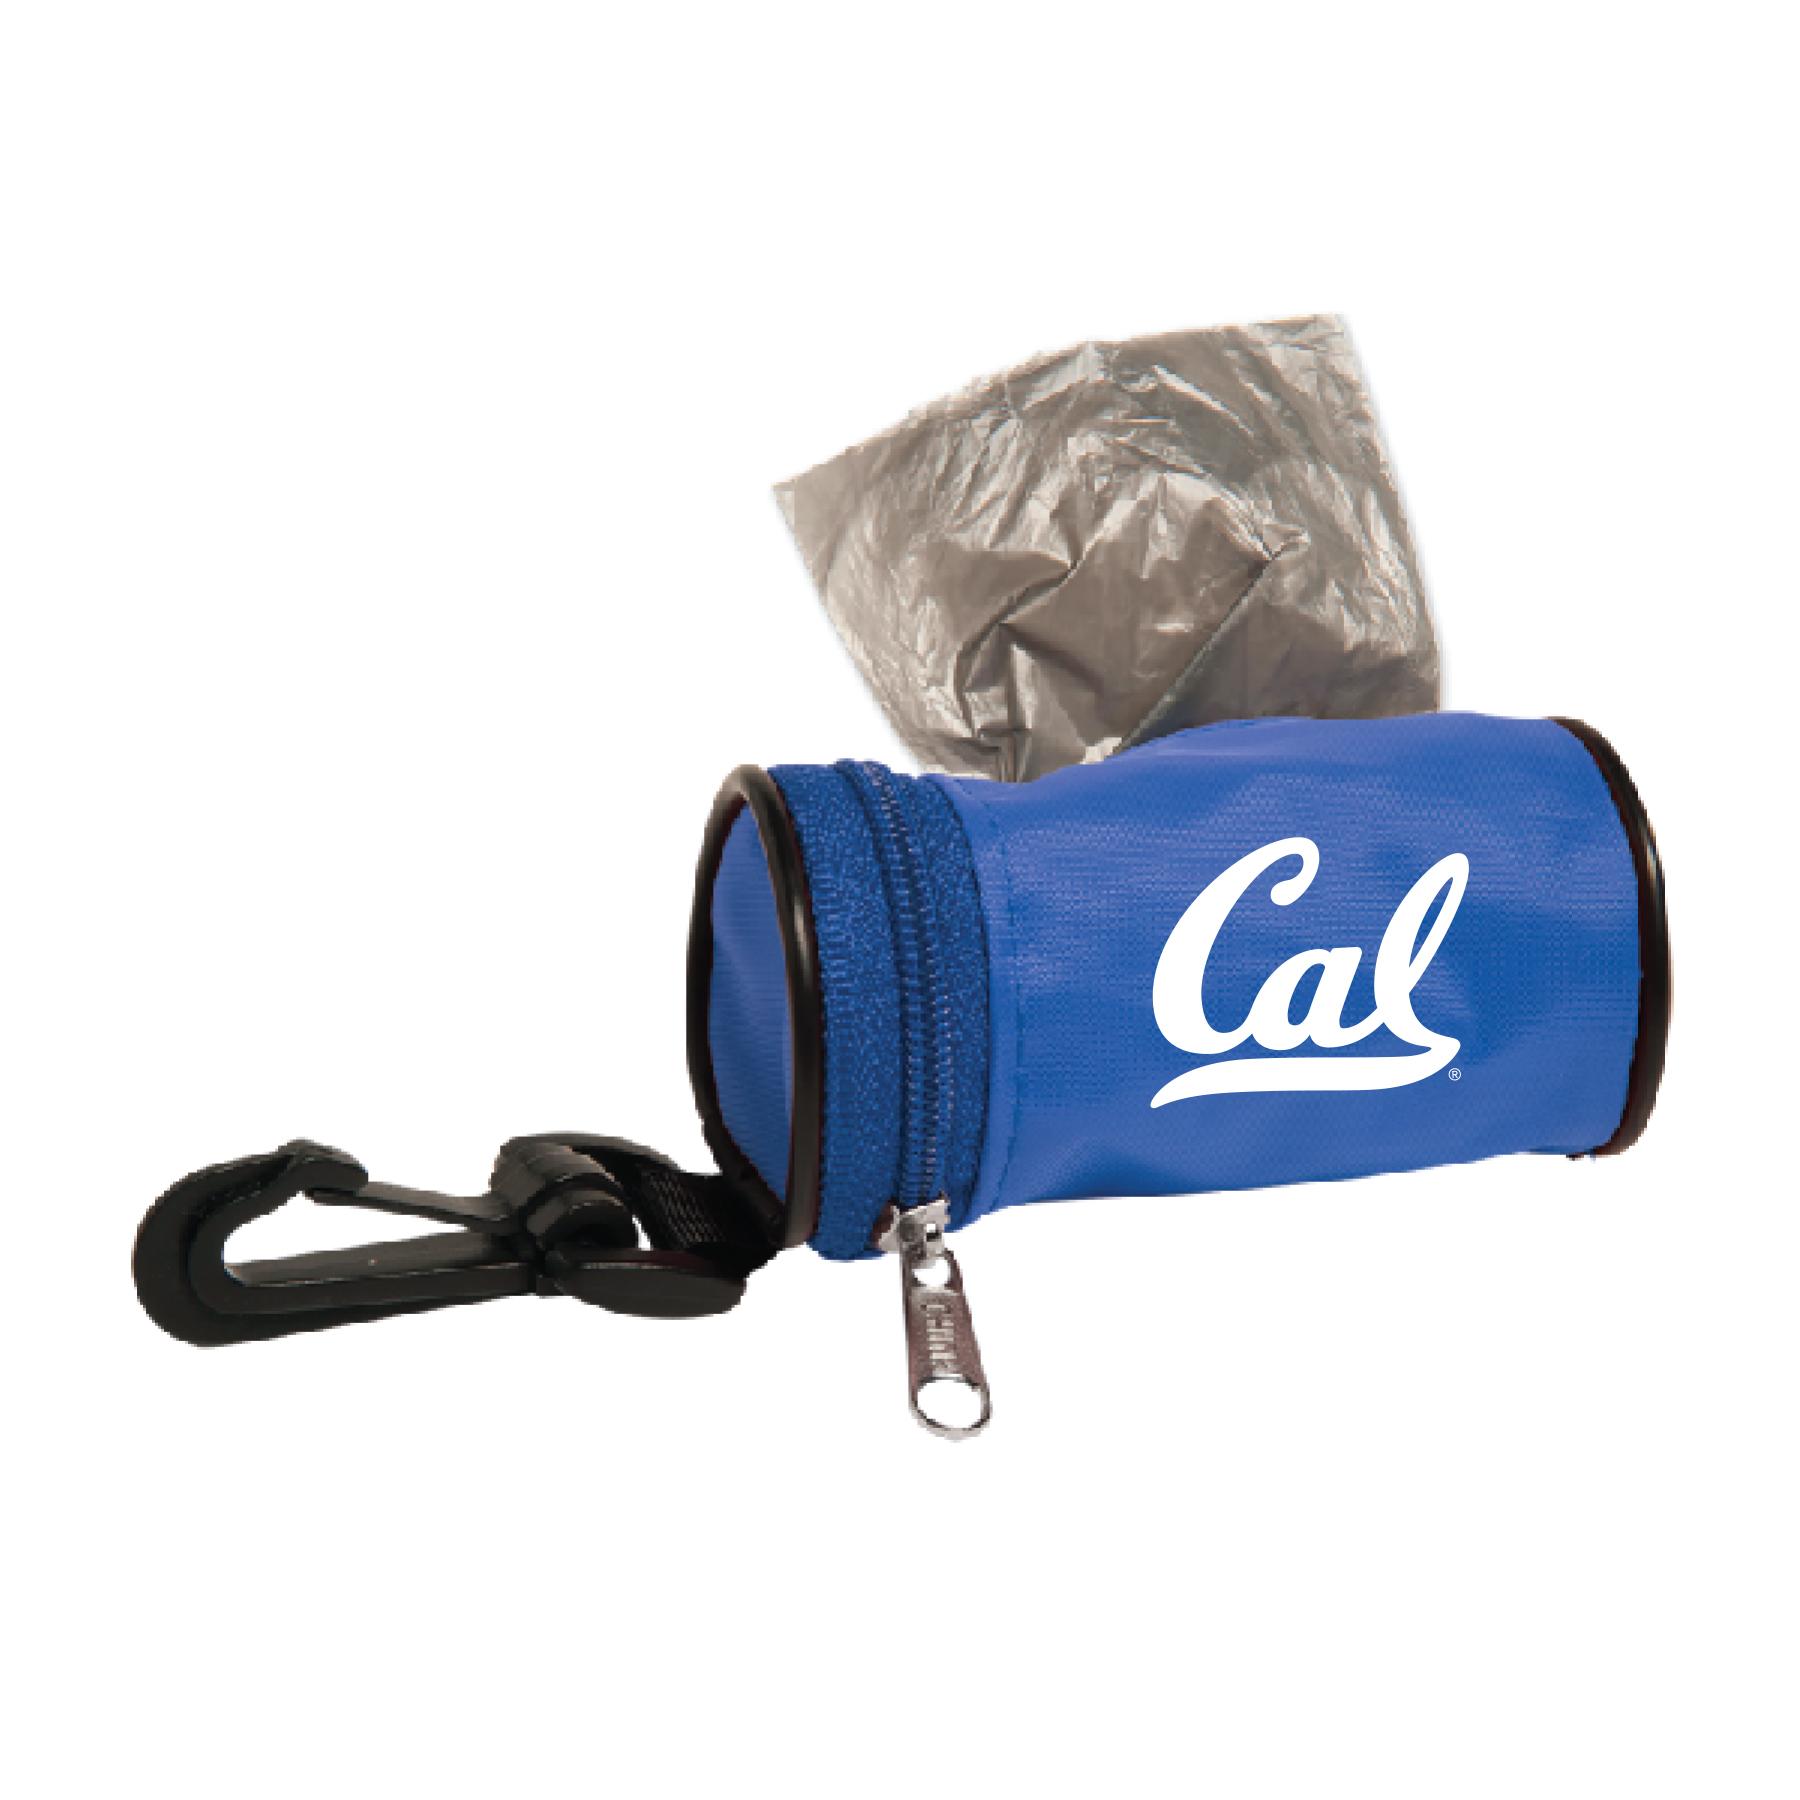 Detailed image of Pet Poop Bag Dispenser Cal Logo